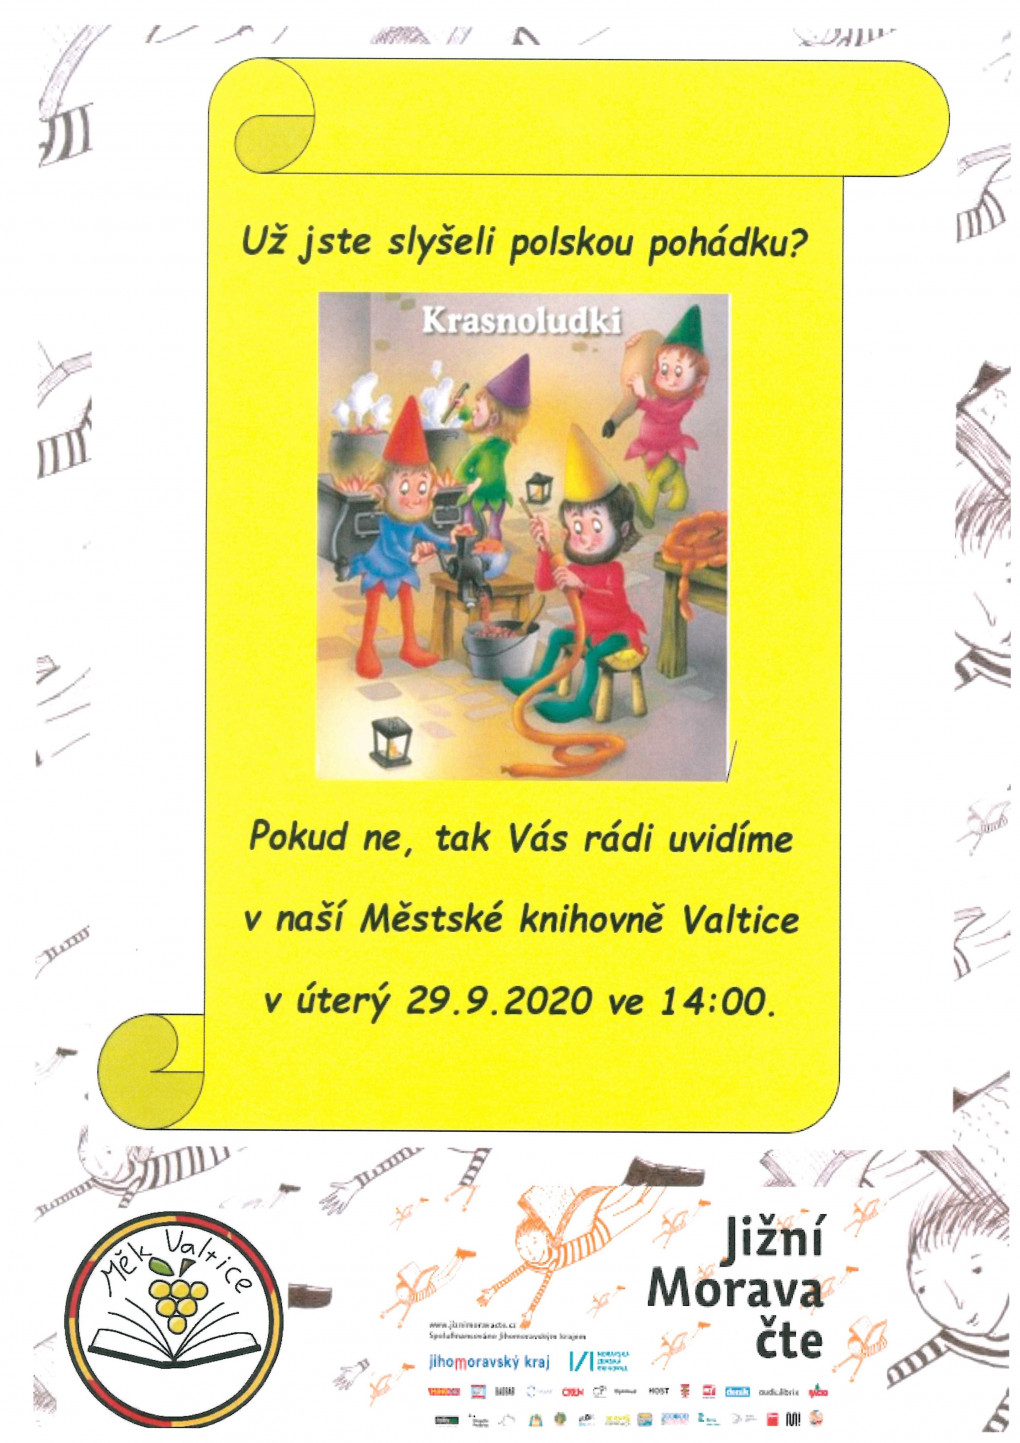 polska_pohadka1.jpg